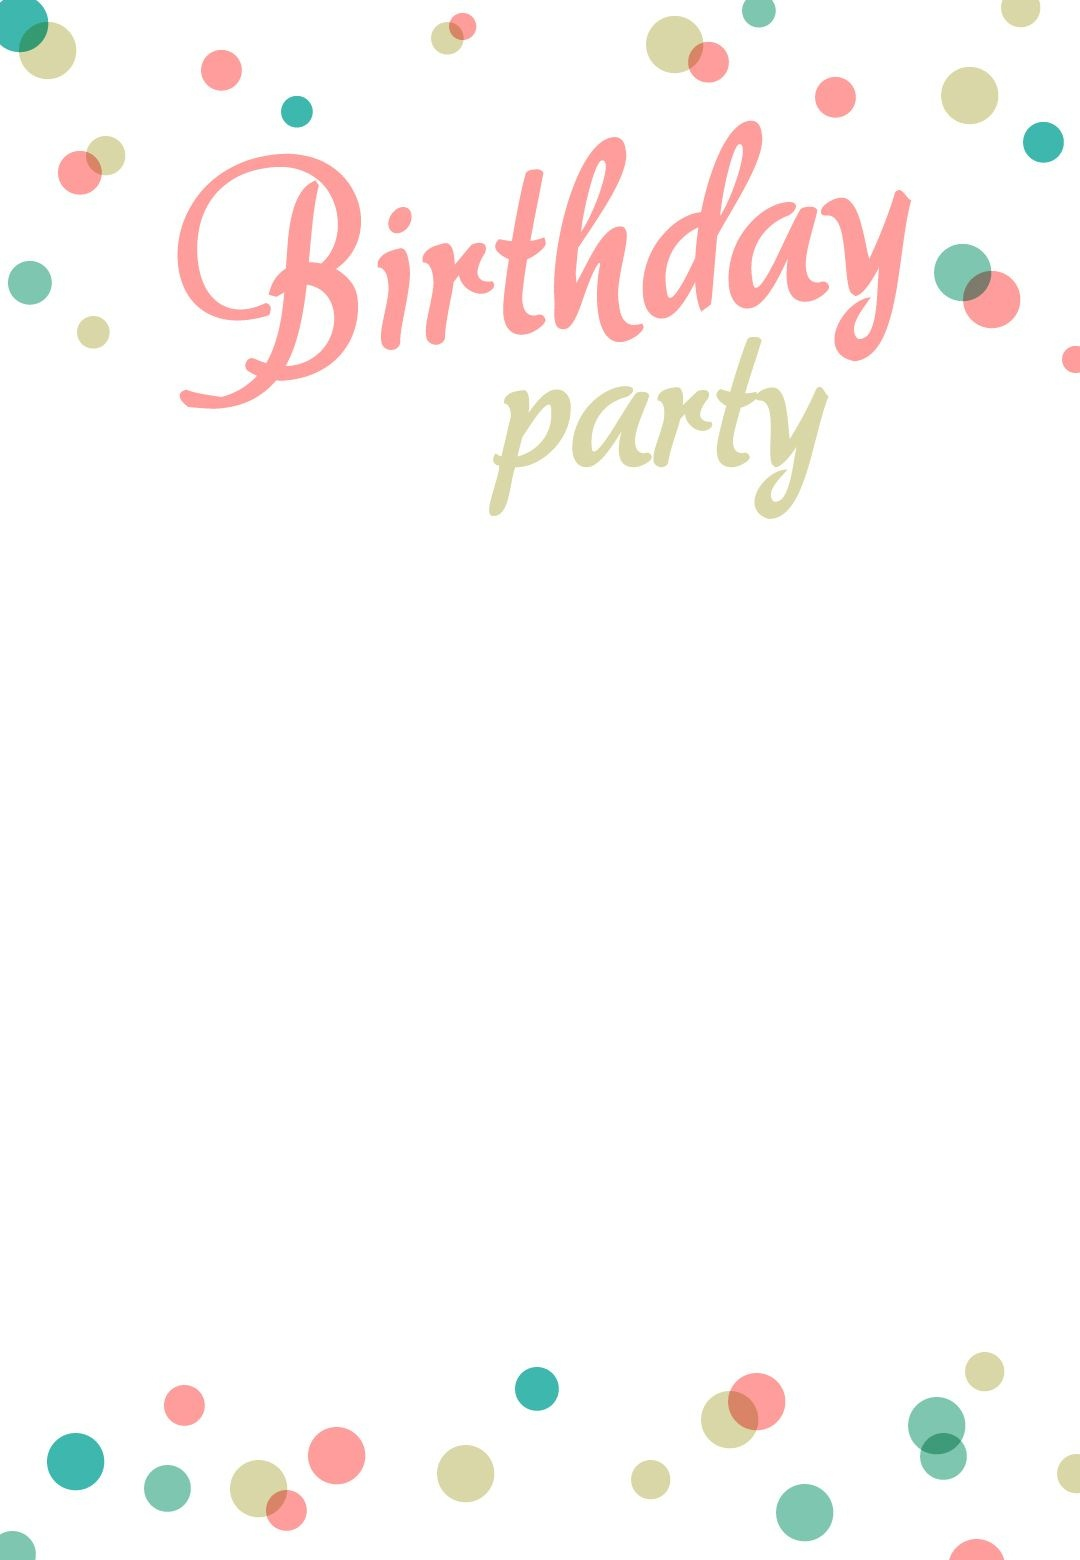 Birthday Party Dots - Free Printable Birthday Invitation Template - Free Printable Birthday Invitation Templates